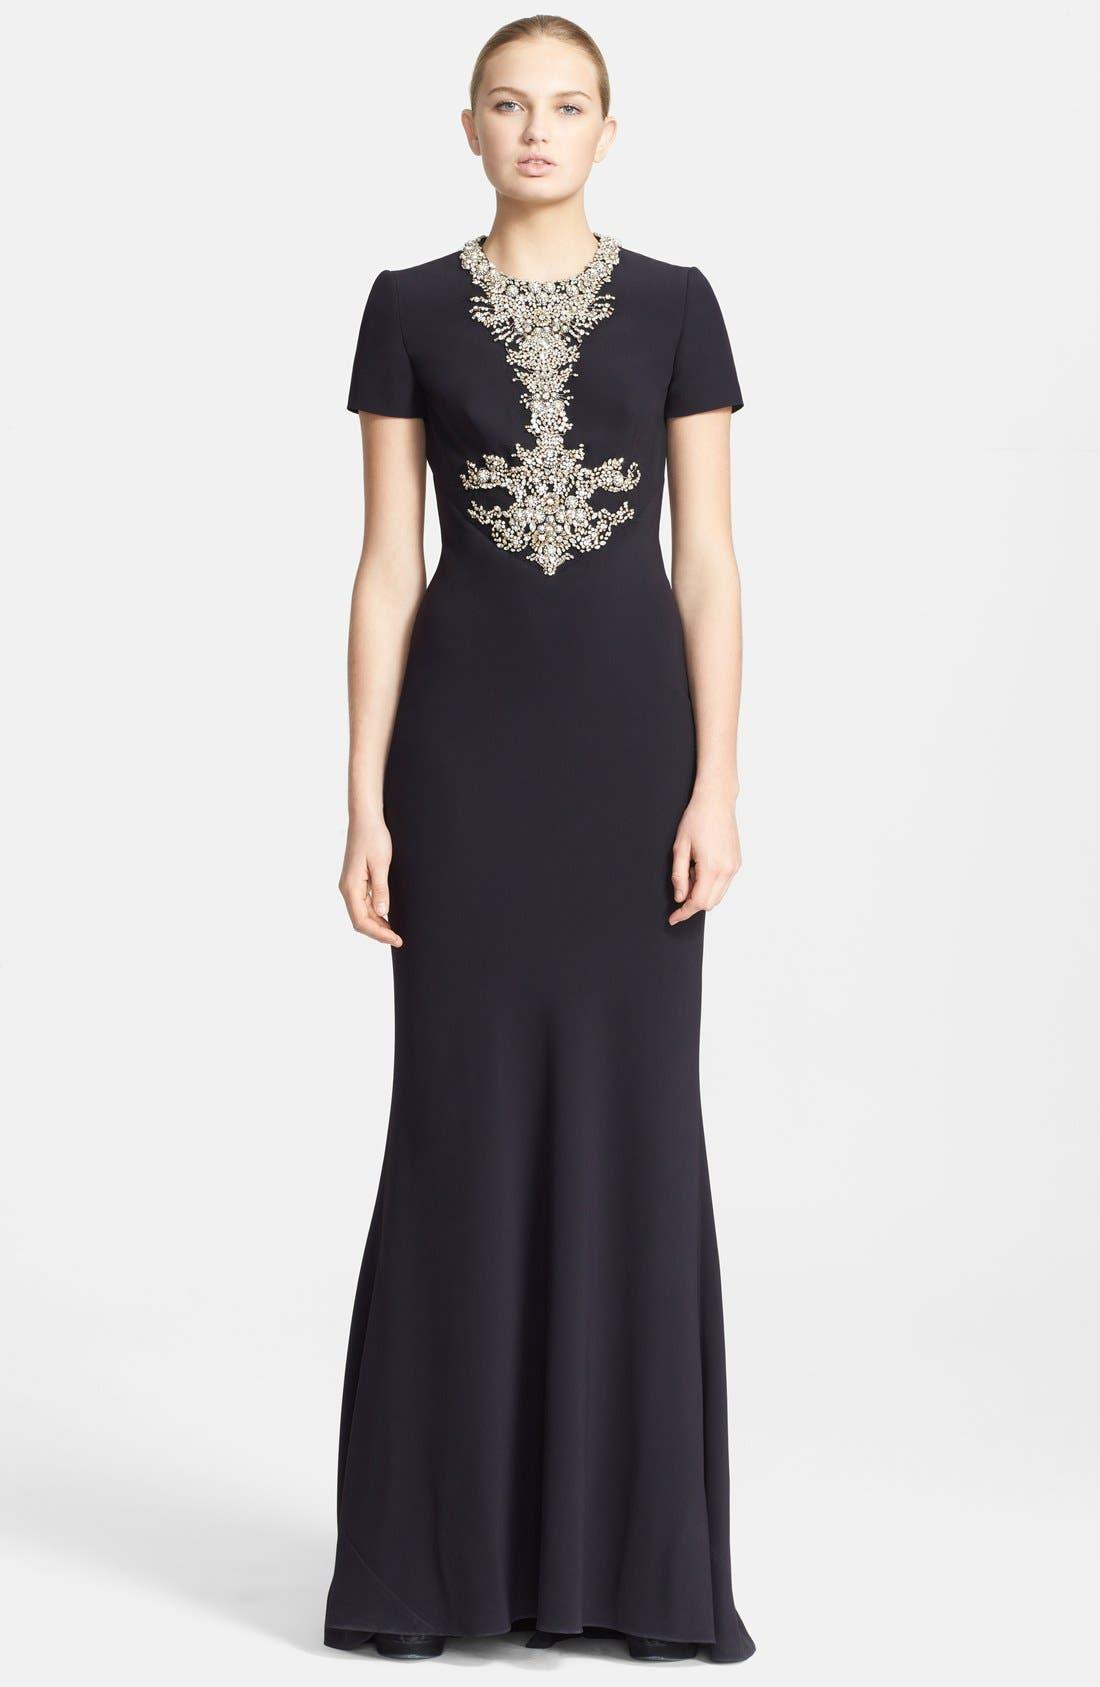 Alternate Image 1 Selected - Alexander McQueen Embellished Crepe Gown